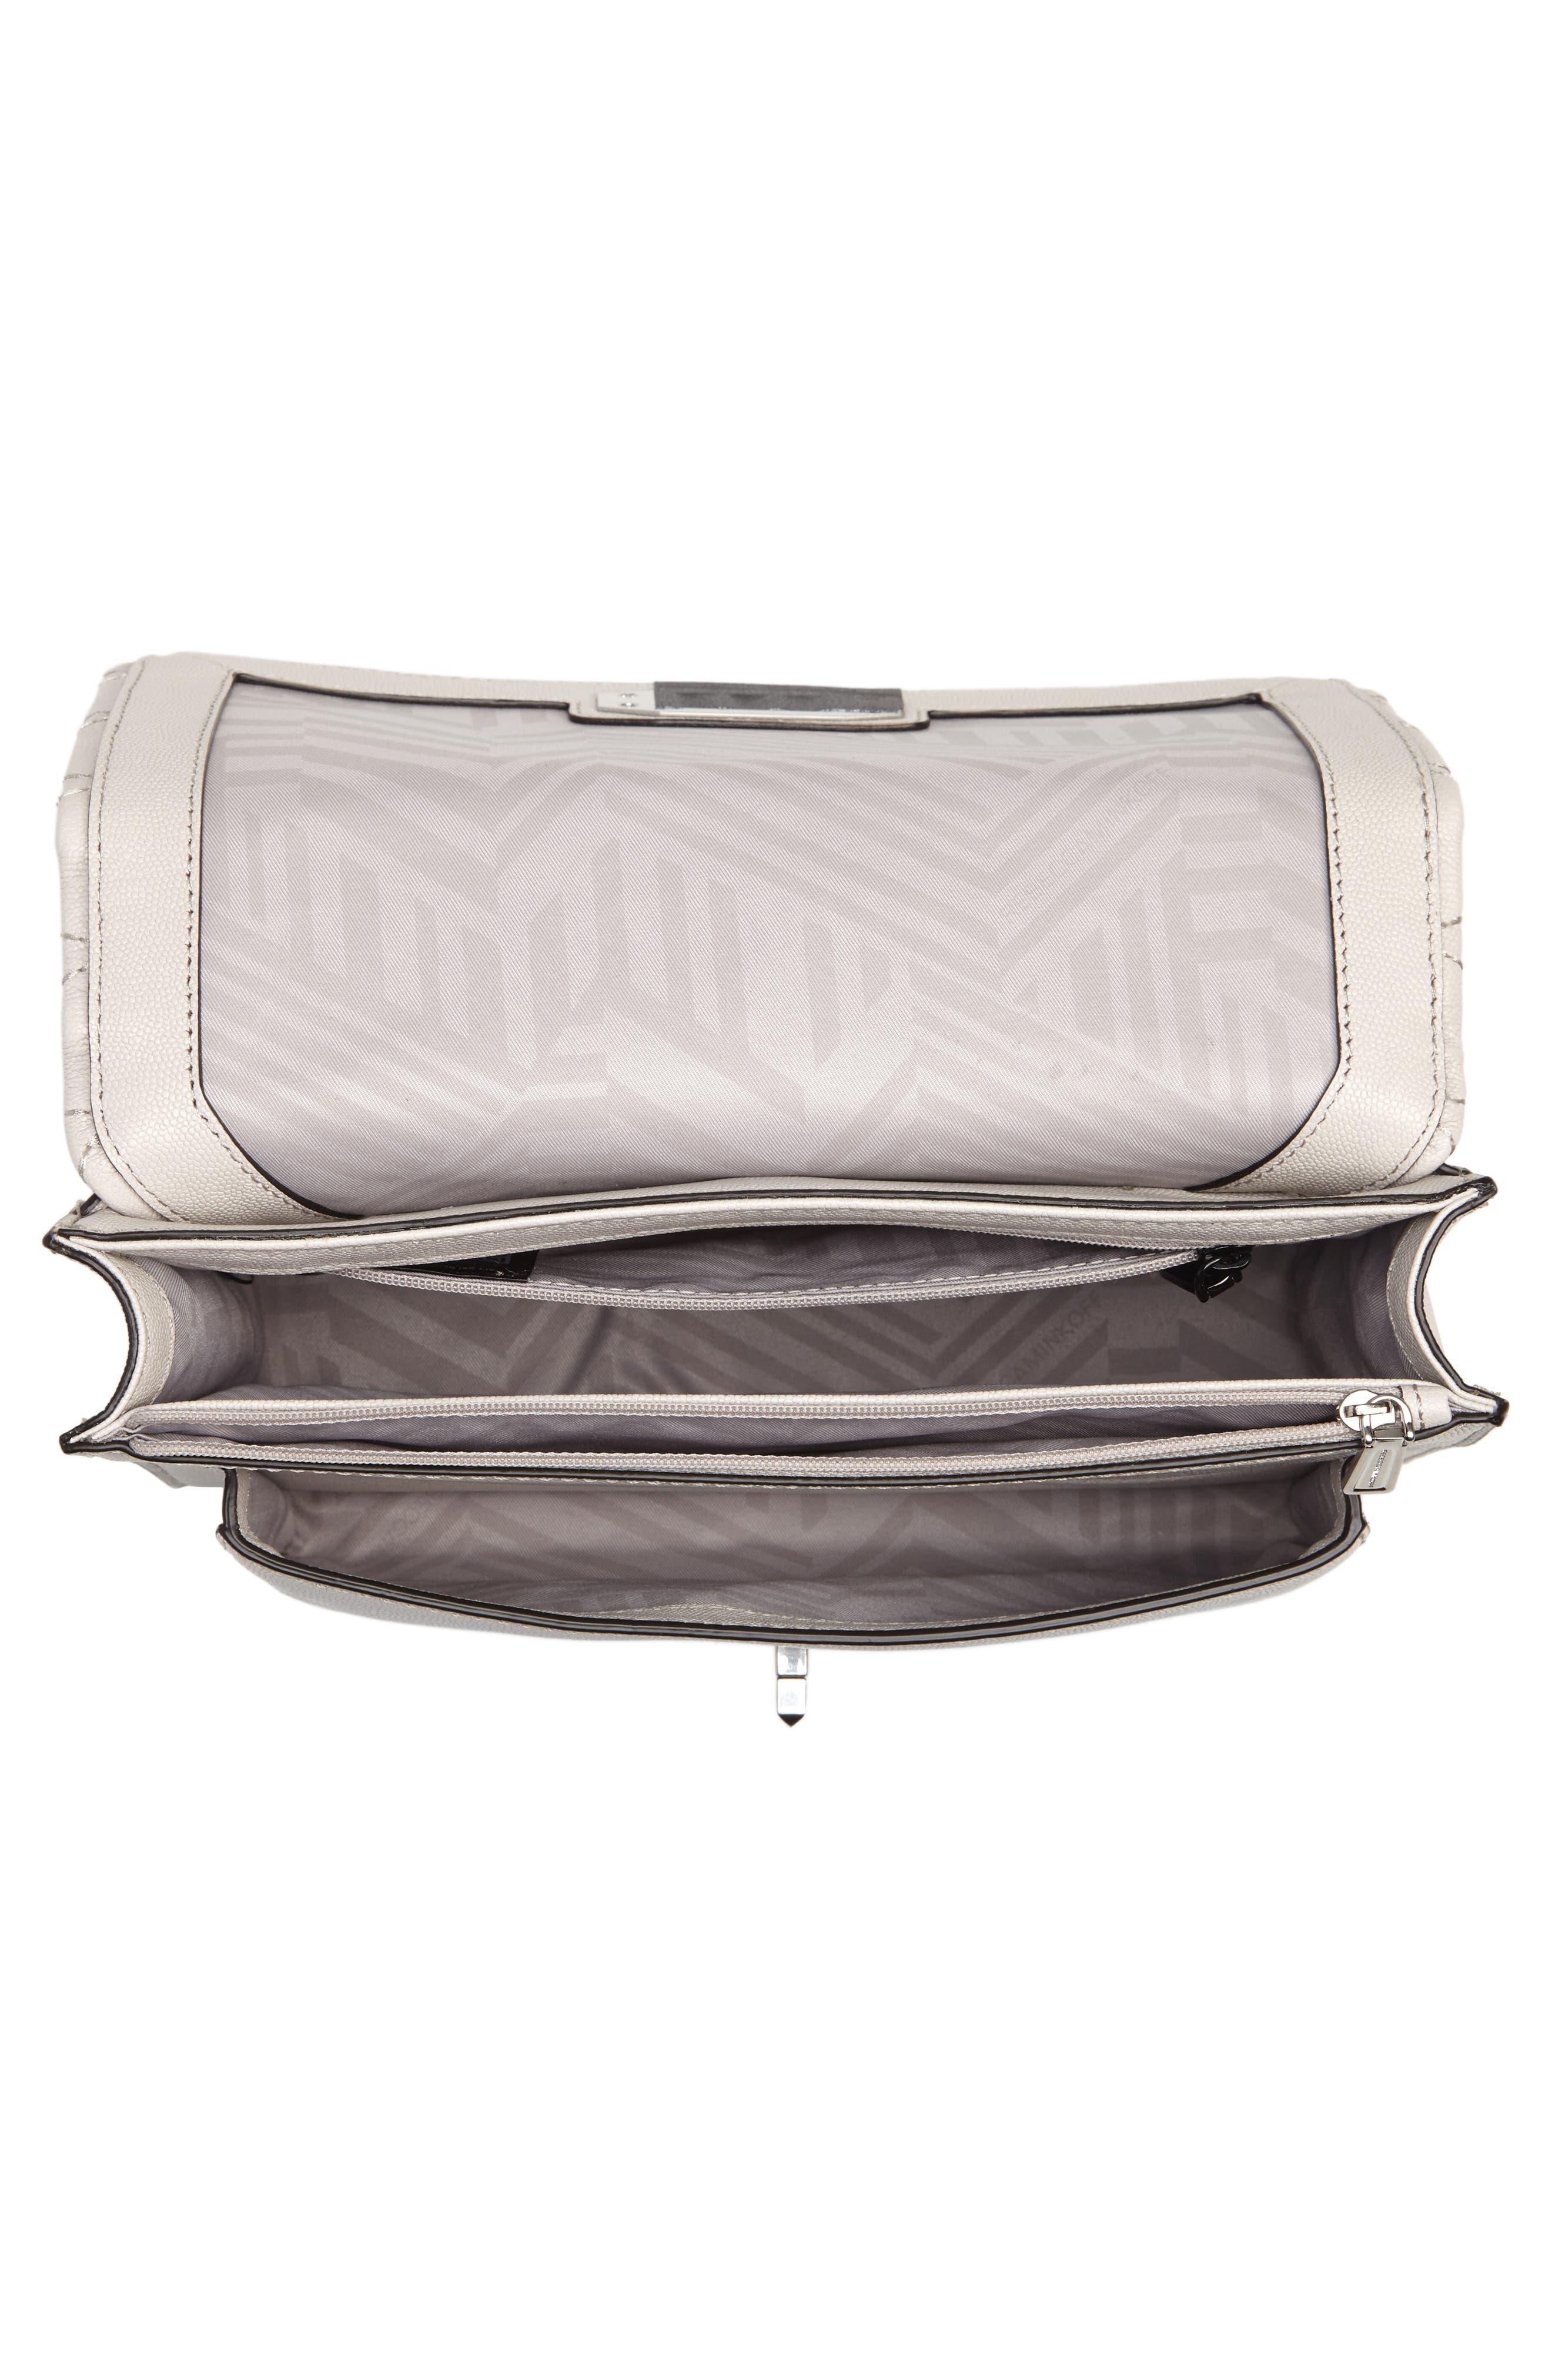 Medium Je T'aime Convertible Leather Crossbody Bag,                             Alternate thumbnail 40, color,